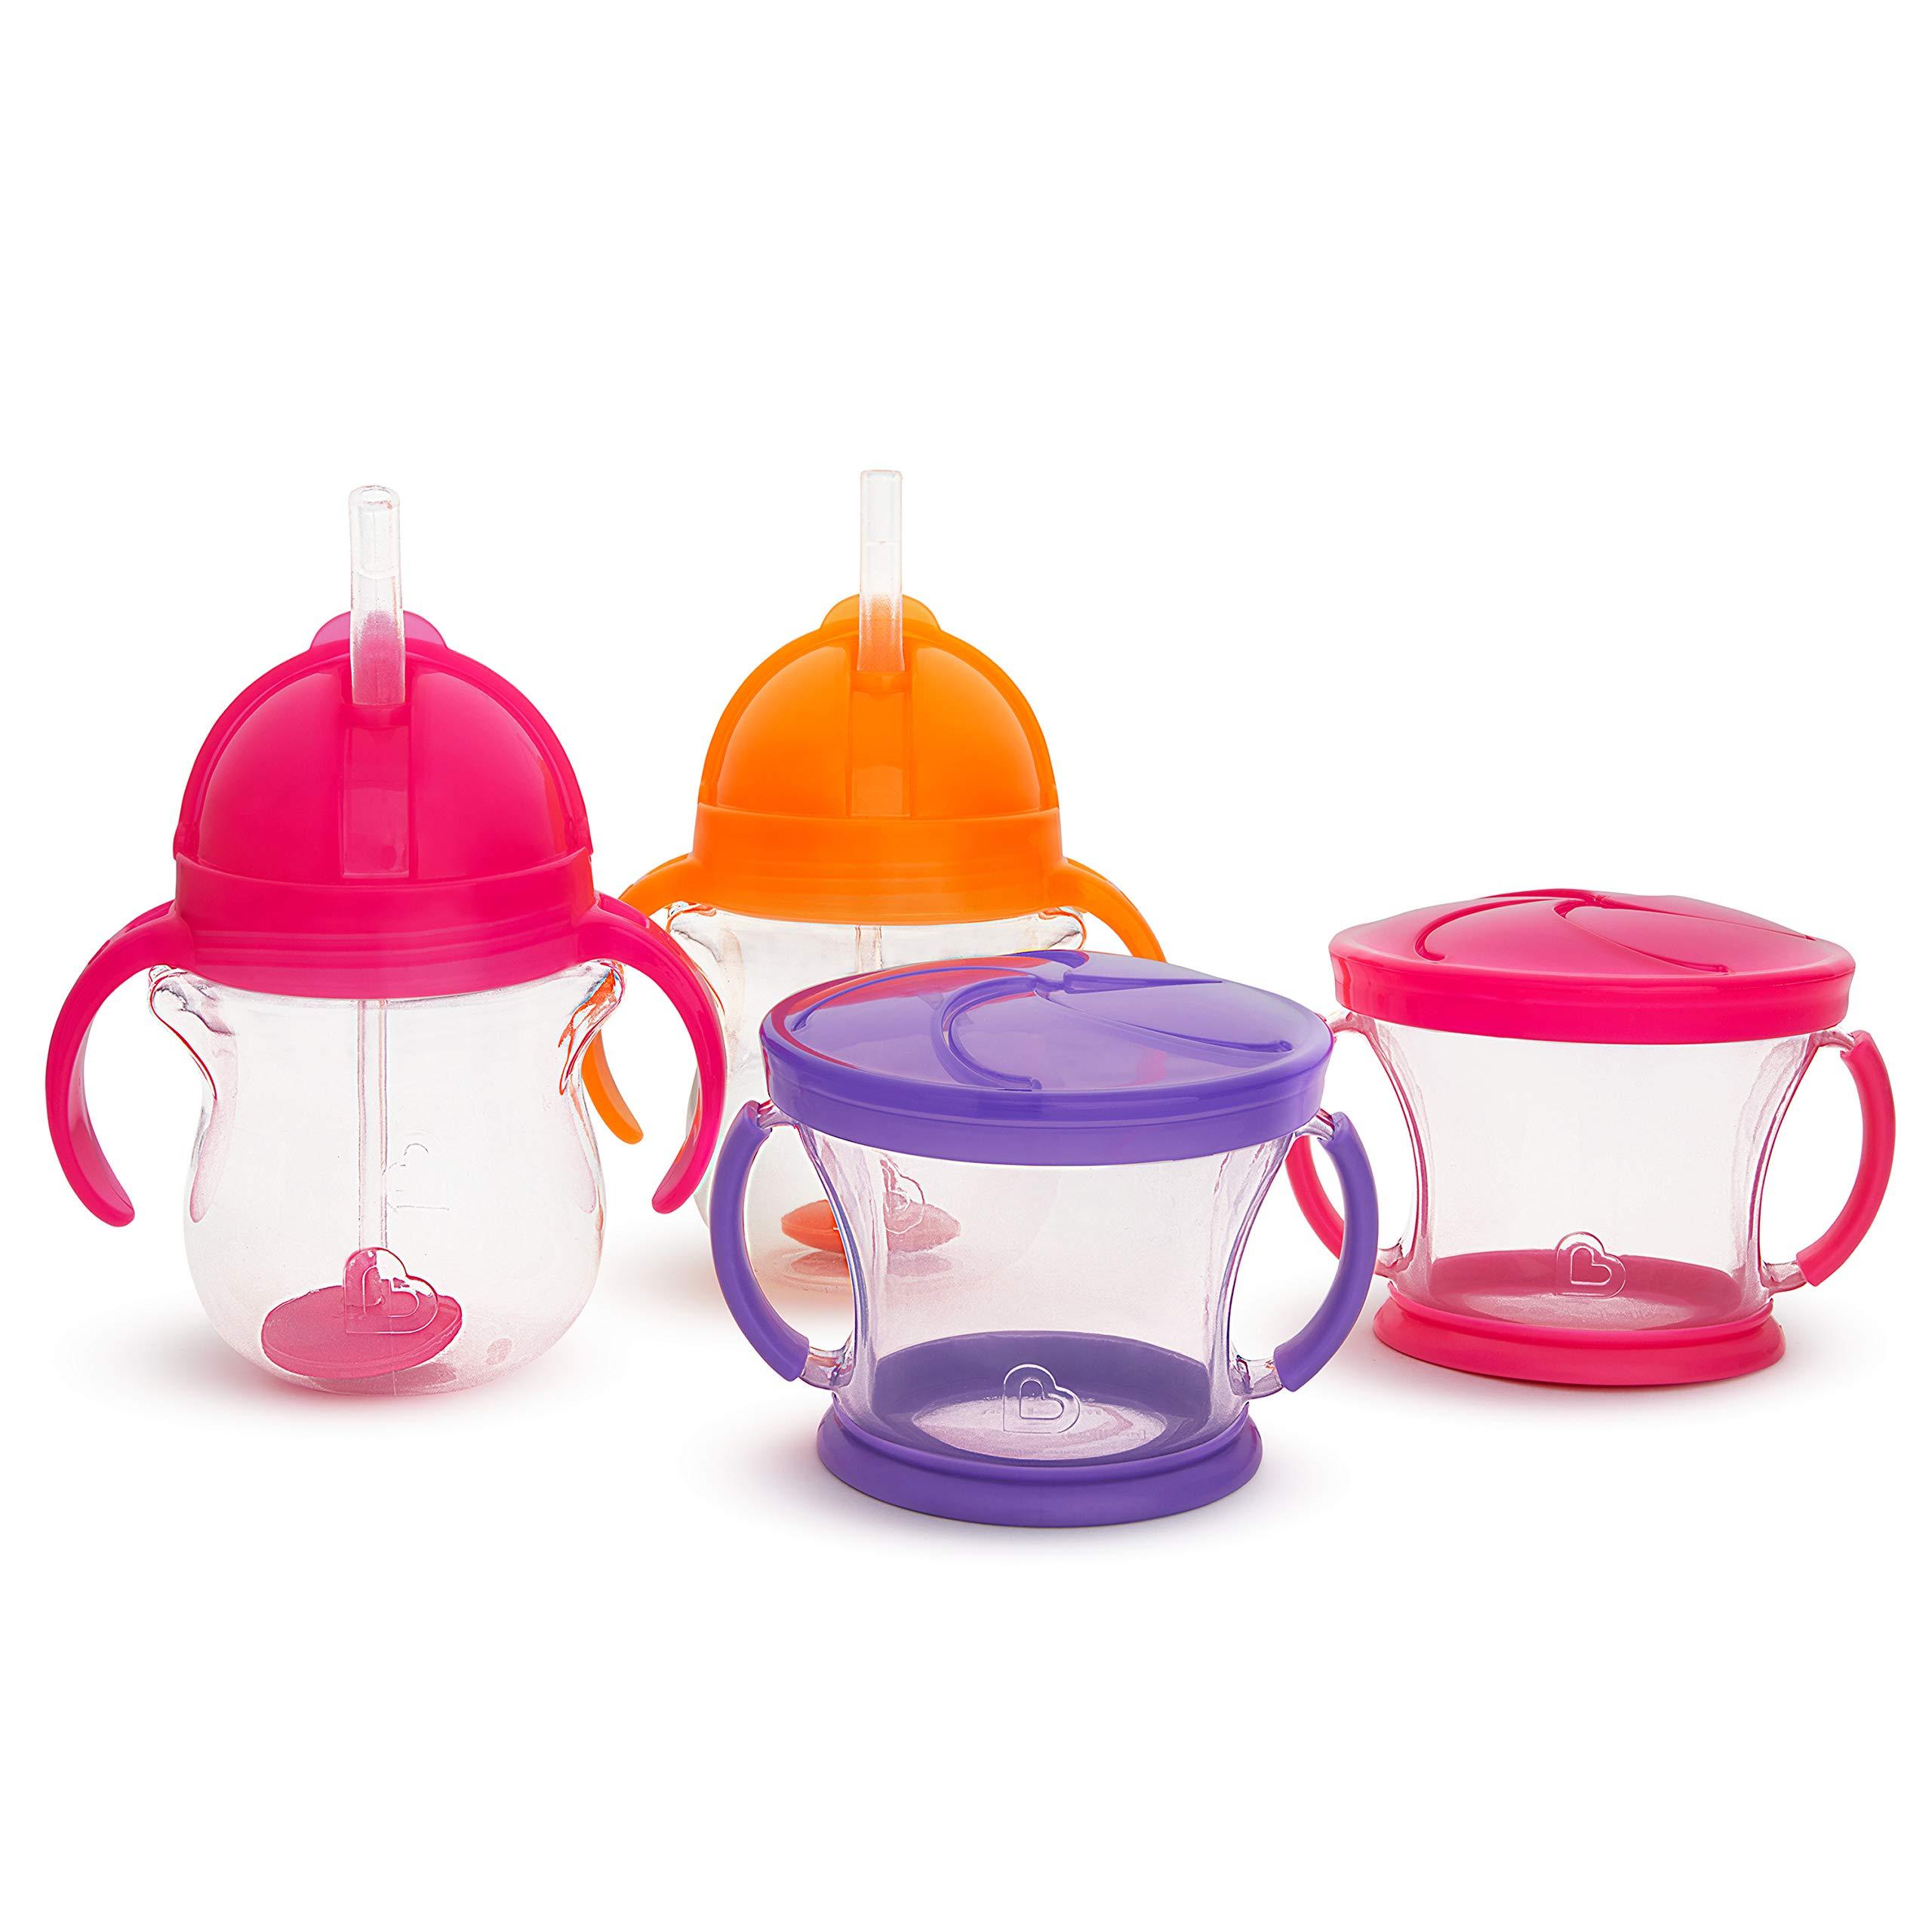 Munchkin Happy Snacker Snack Catcher & Sippy Cup Set, 4 Pack, Pink/Purple/Orange by Munchkin